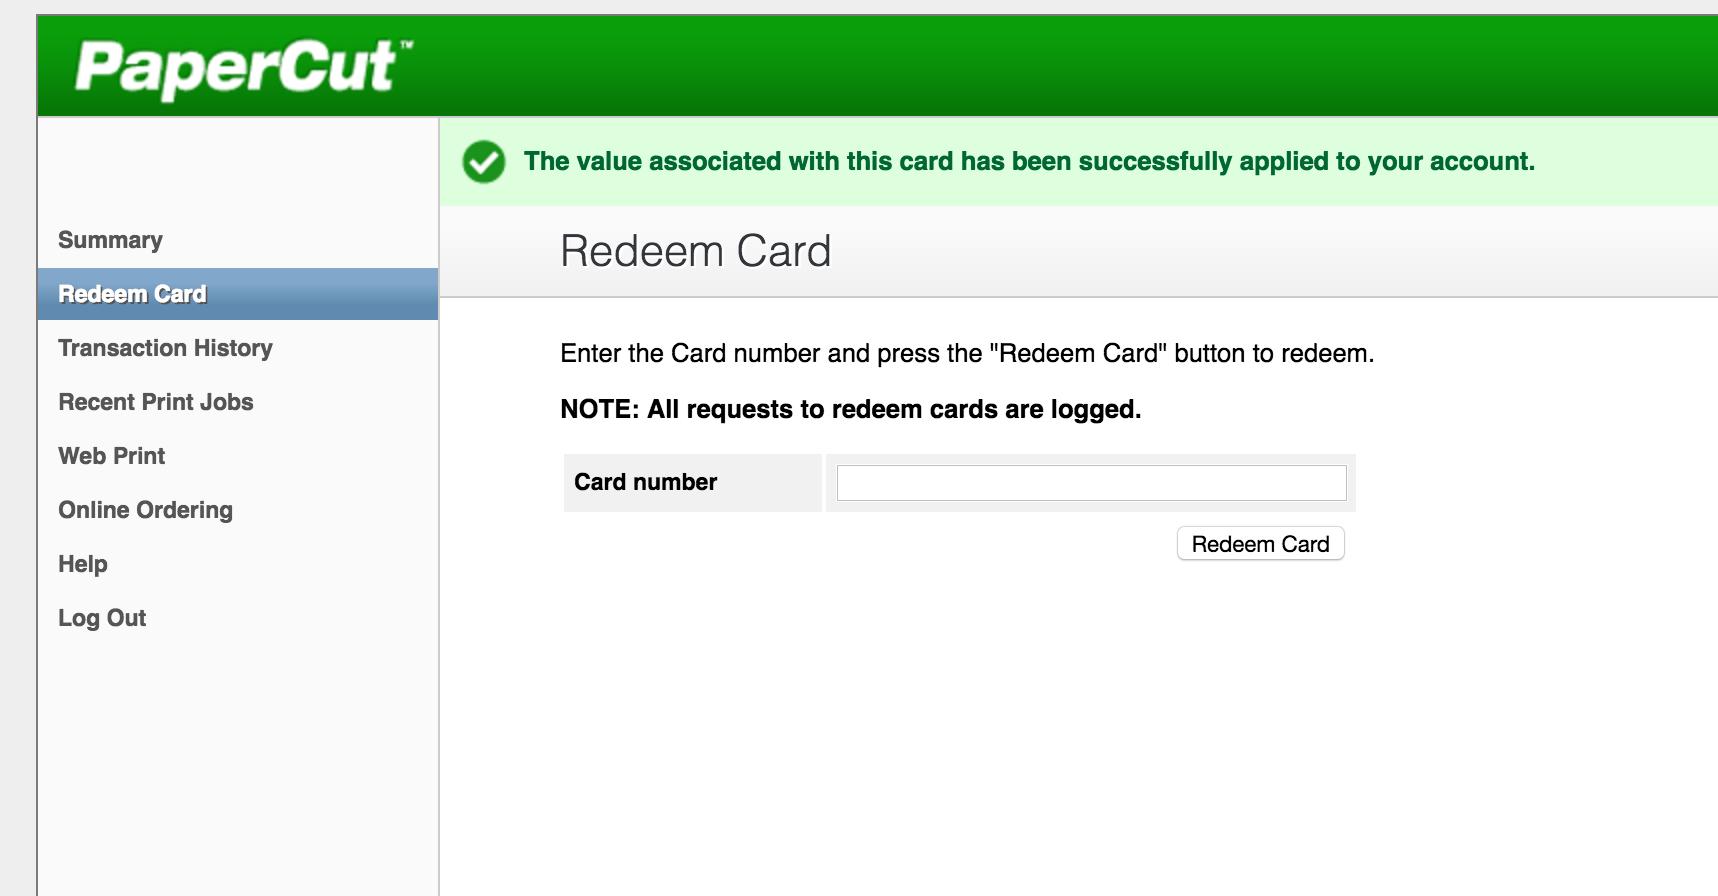 Redeem Card Step 2